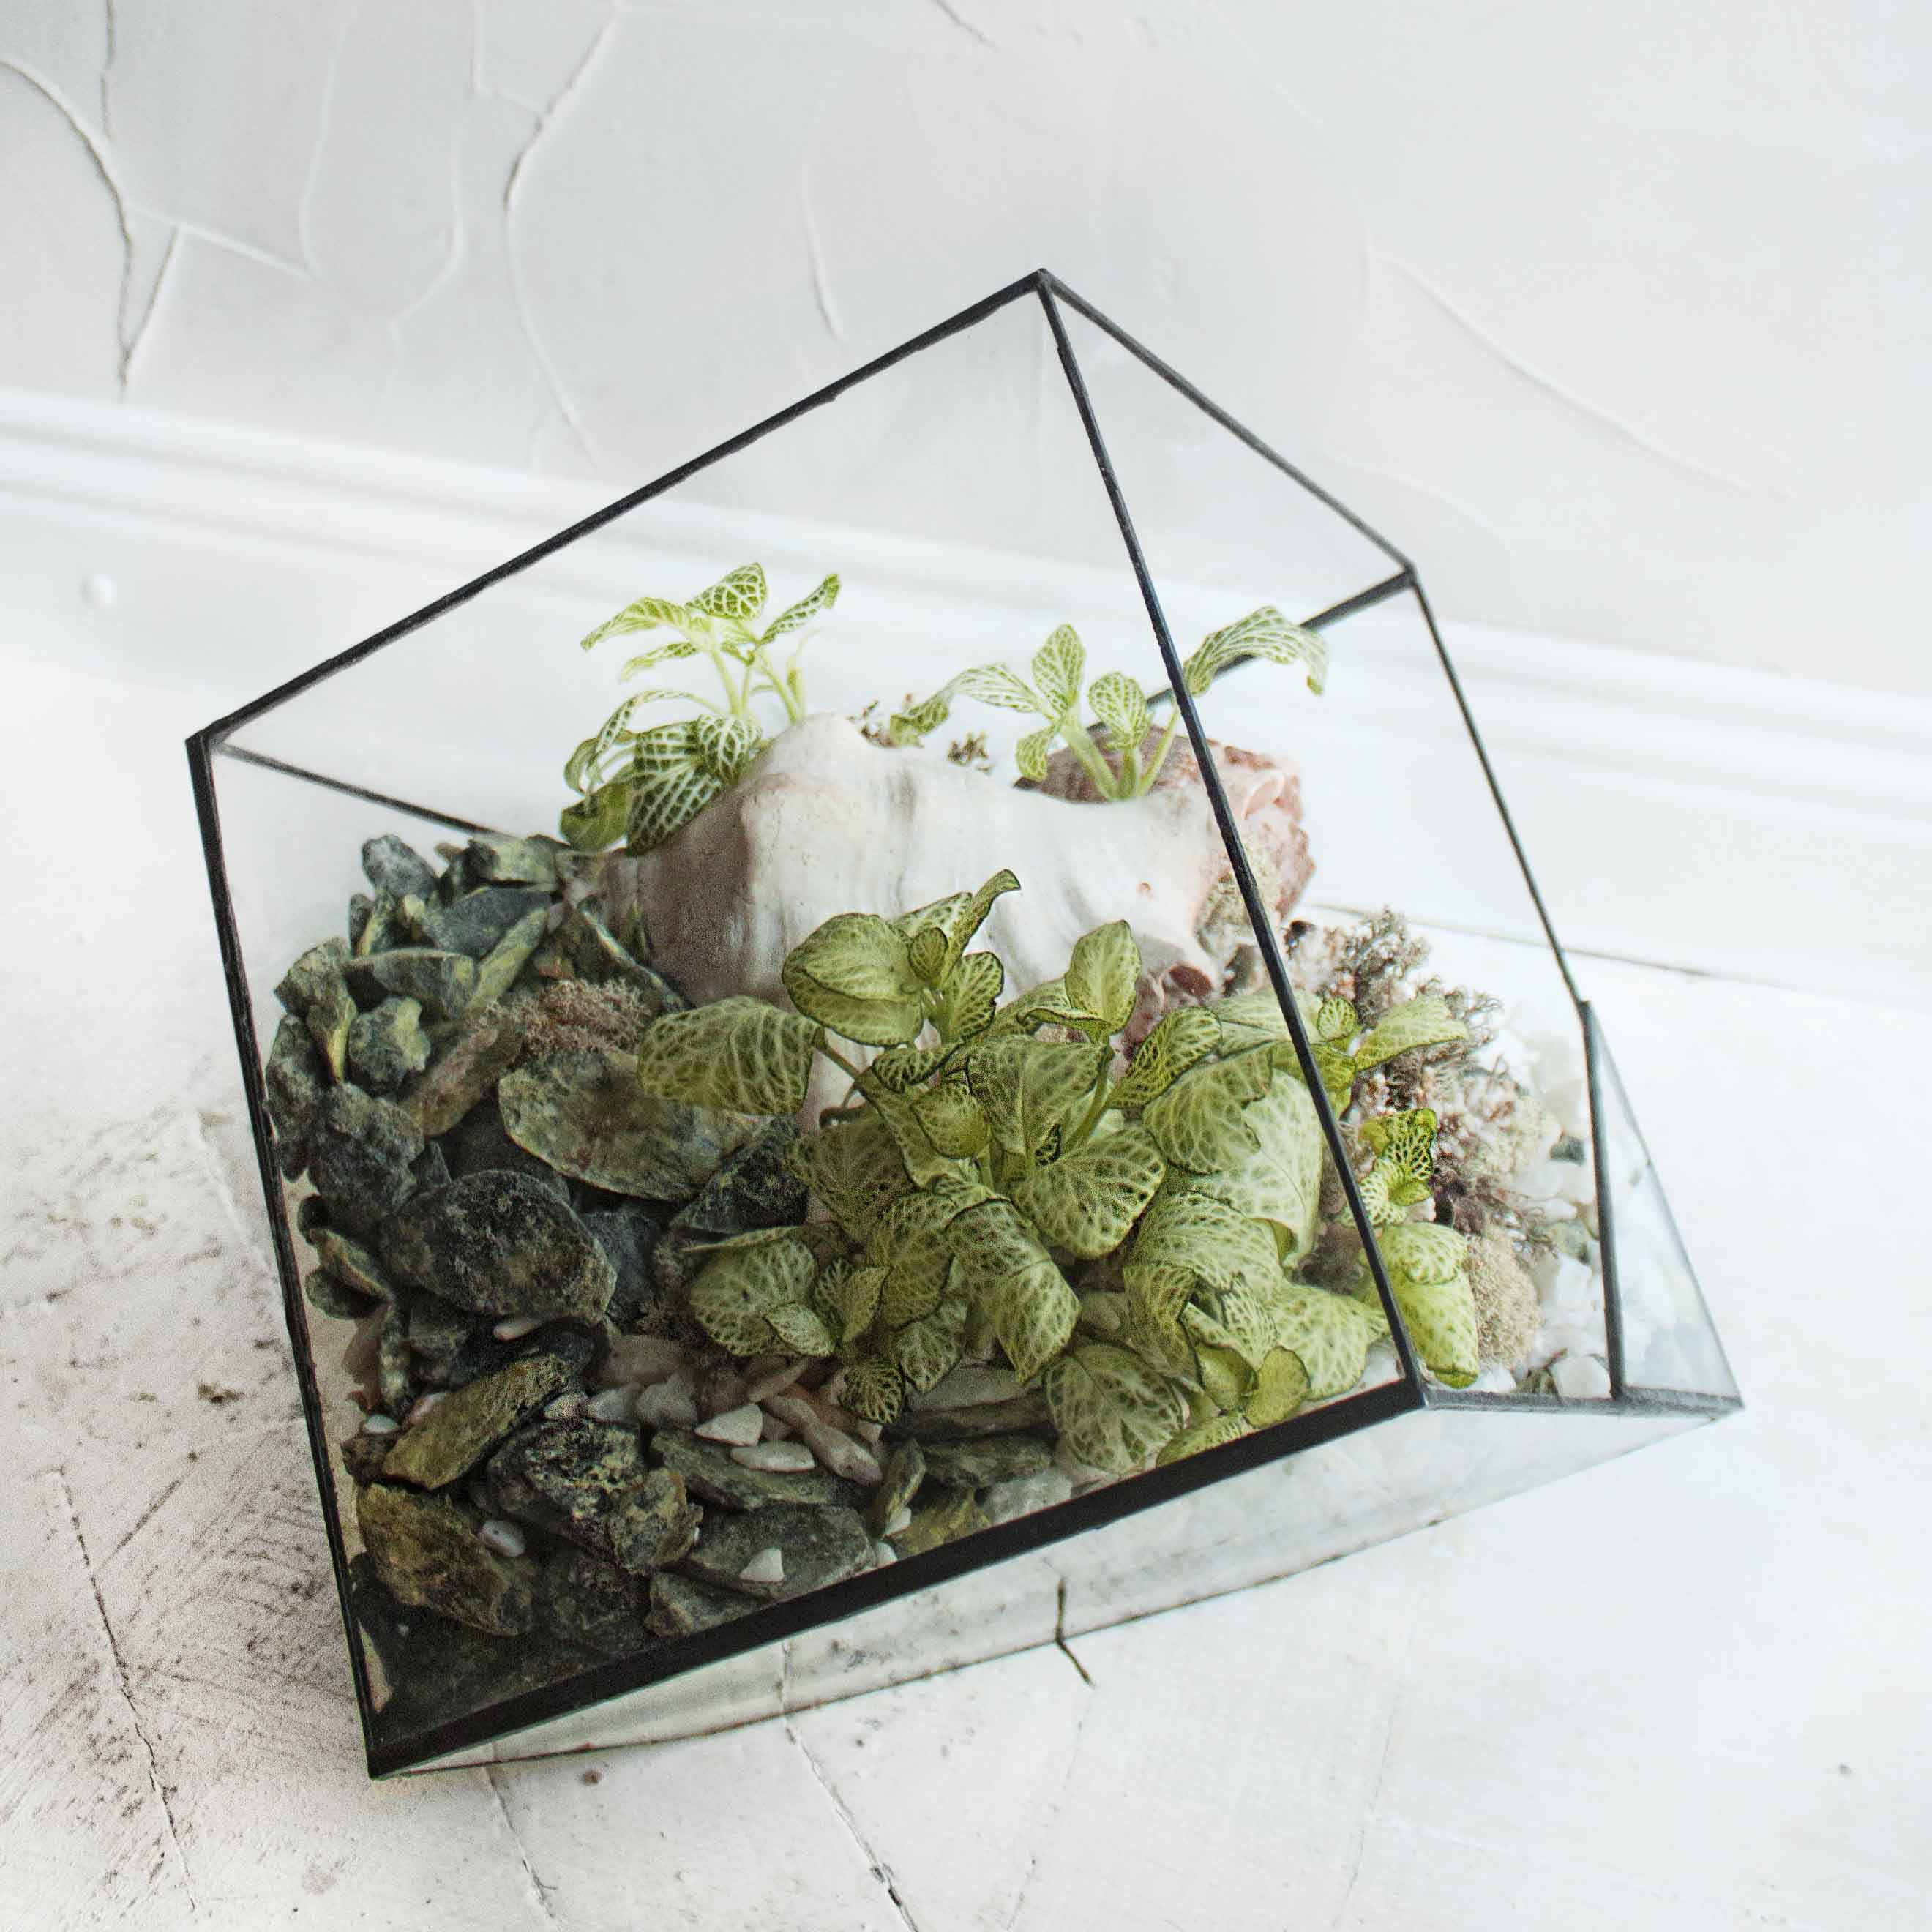 geometric glass plant florarium gift геометрия флорариум подарок стекло растения